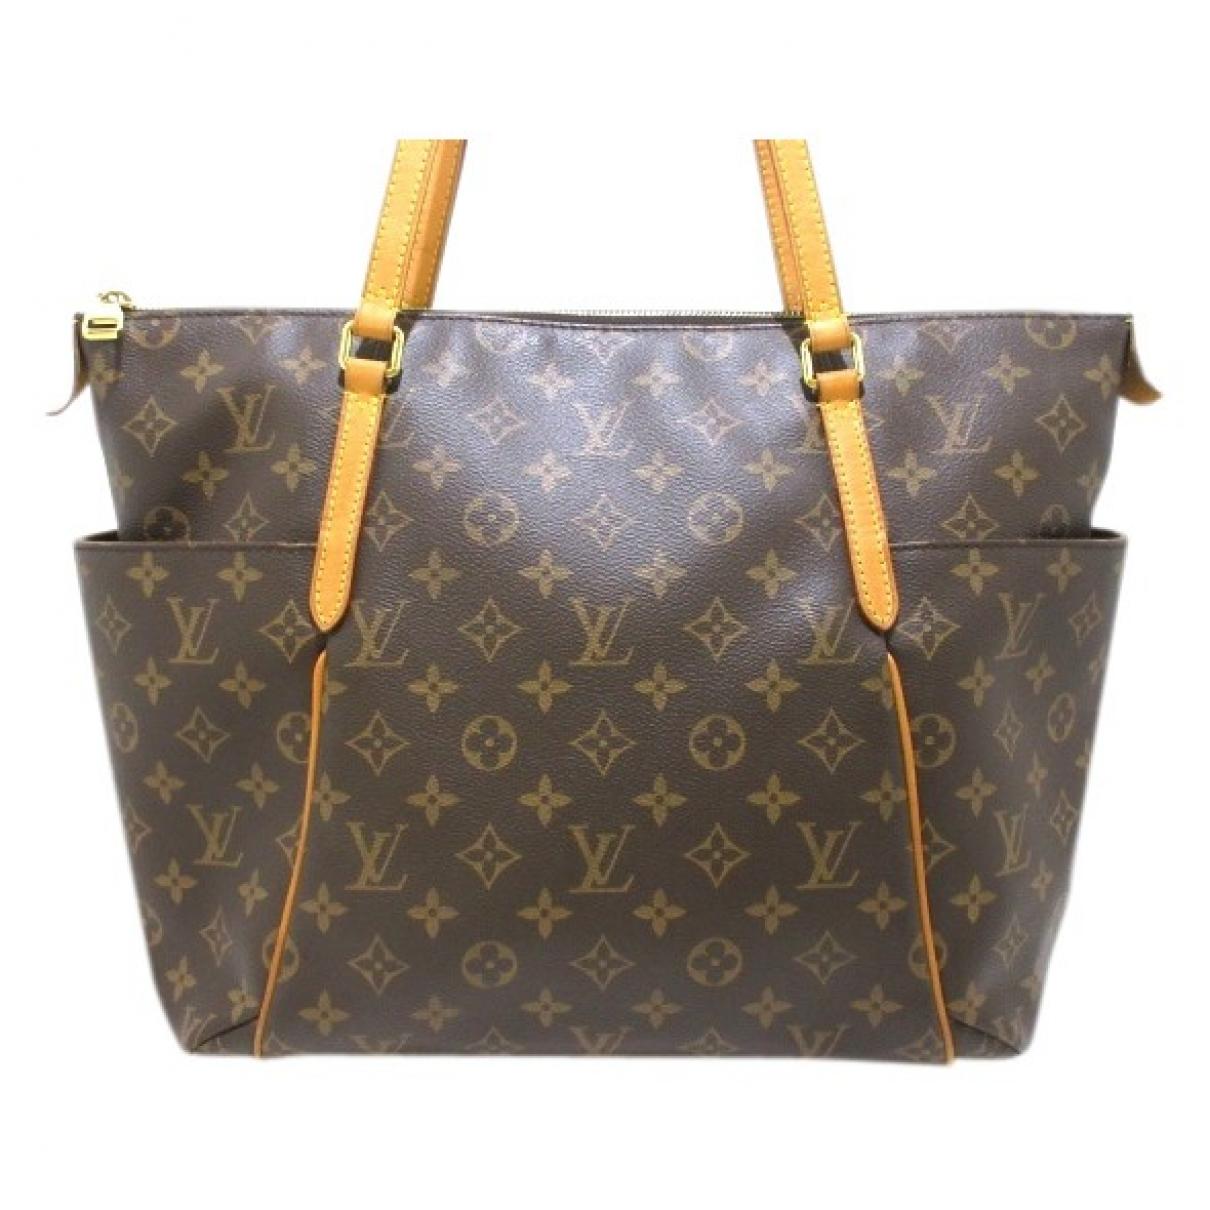 Louis Vuitton - Sac a main Totally pour femme en toile - marron